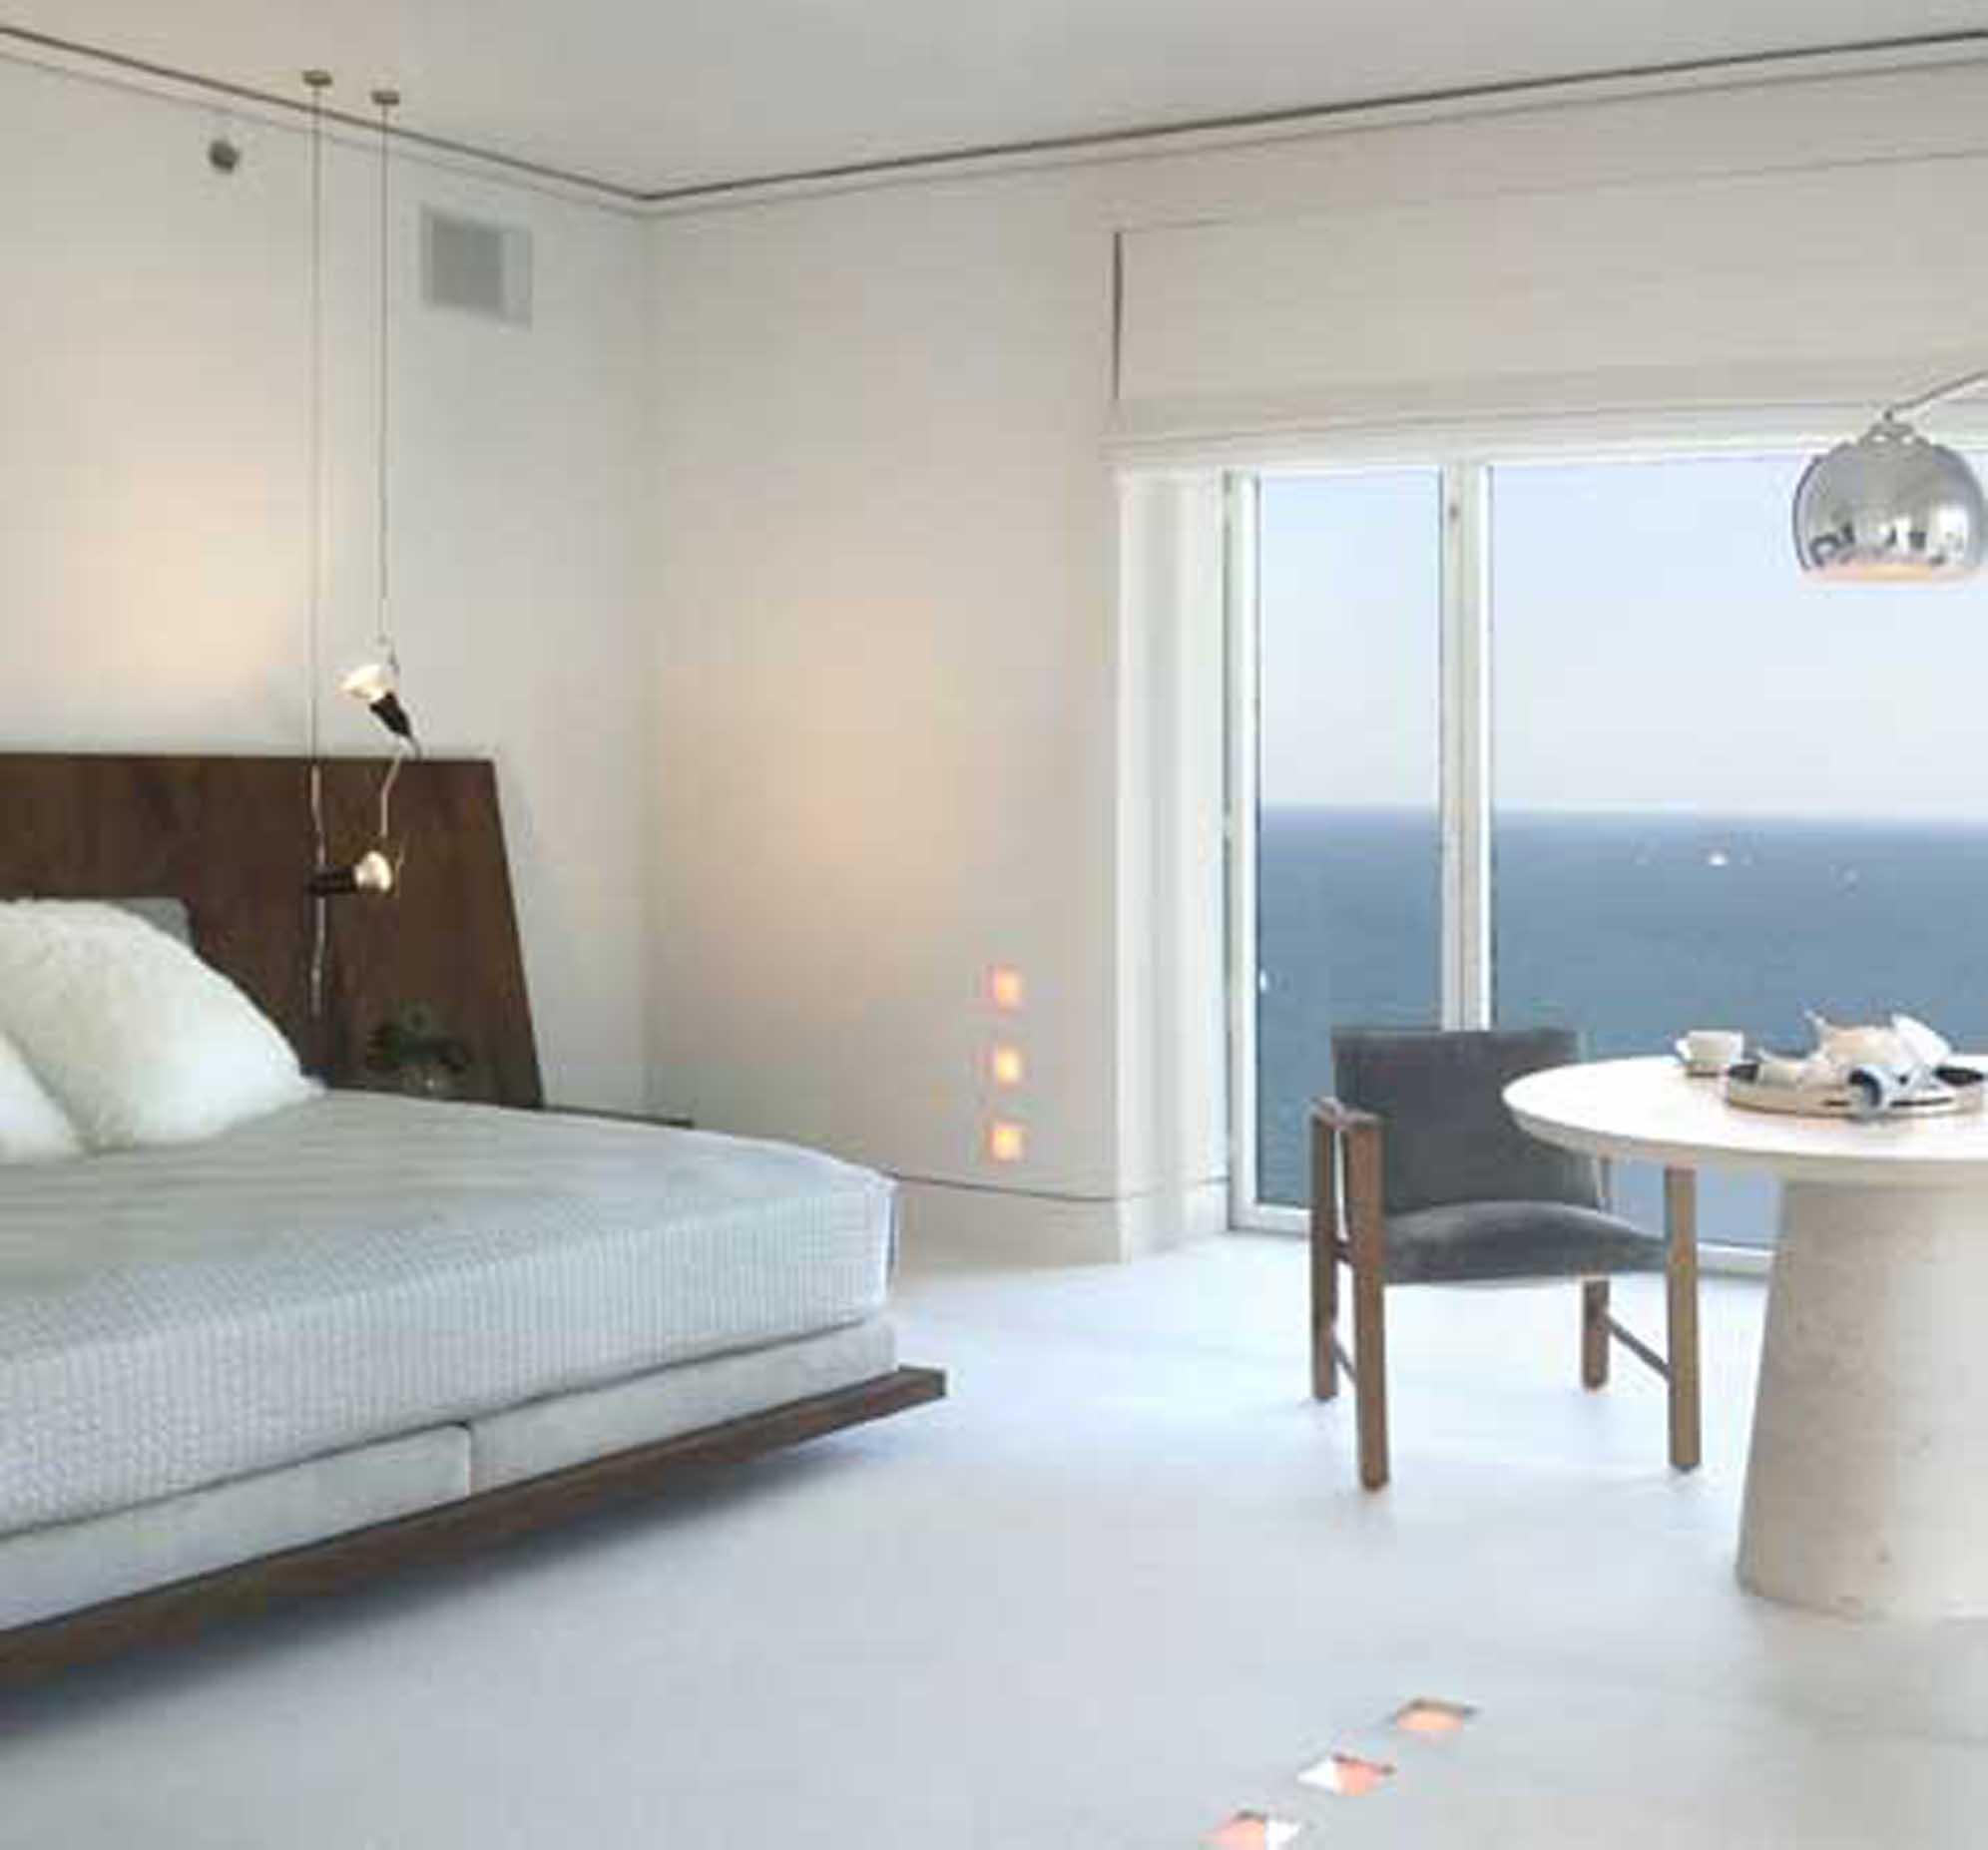 bed1_72.jpg